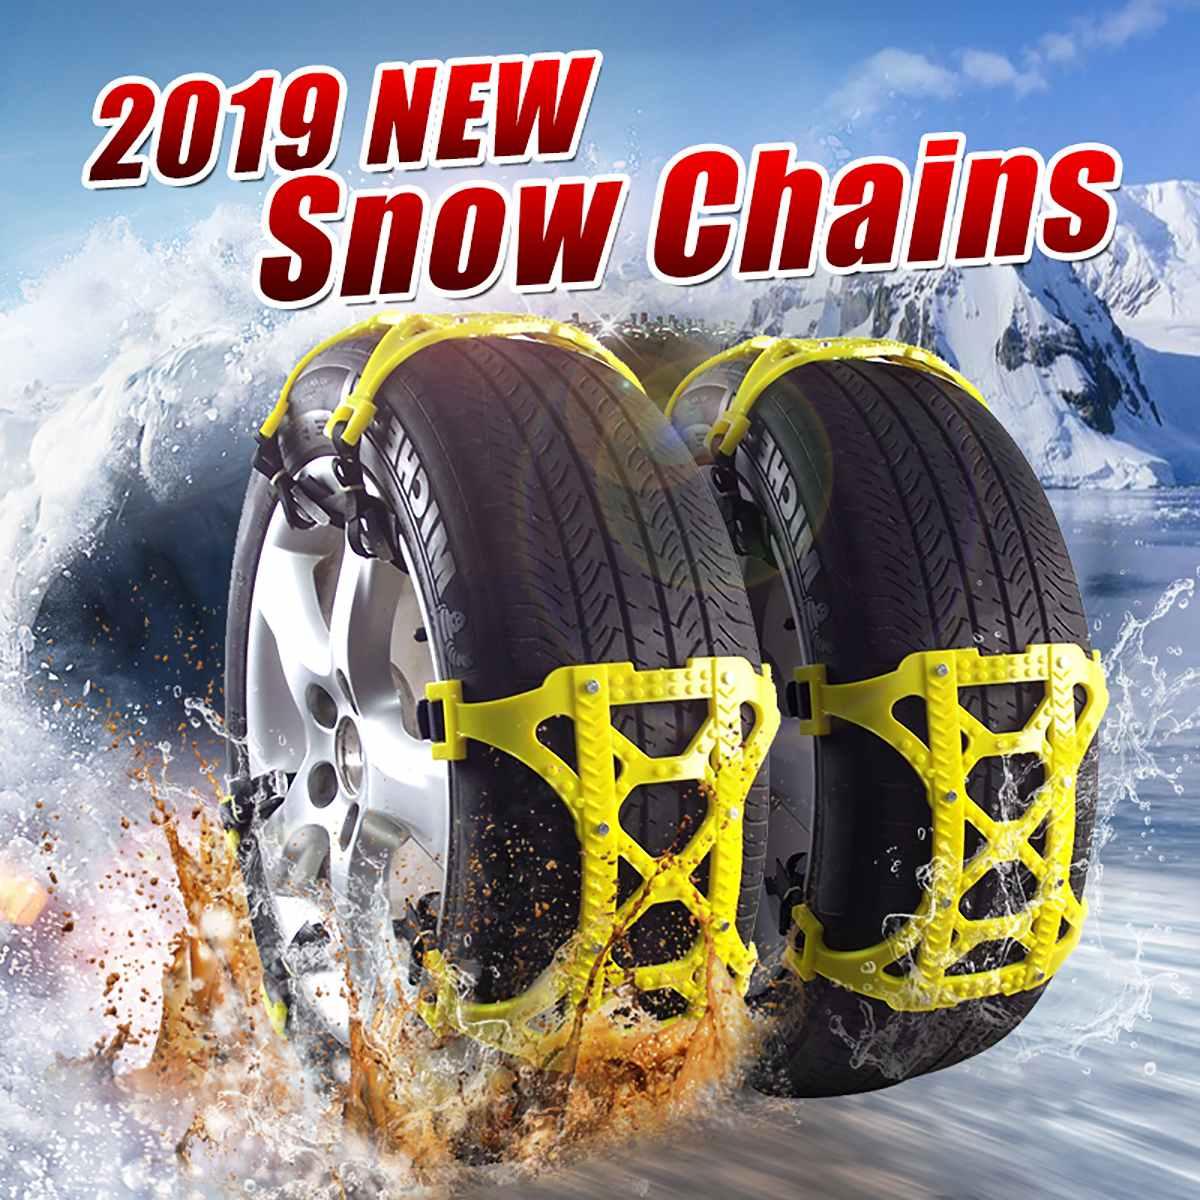 6pcs TPU Snow Chains set Universal Car Suit Tyre Winter Roadway Safety Tire Chains Snow Climbing Mud Ground Anti Slip